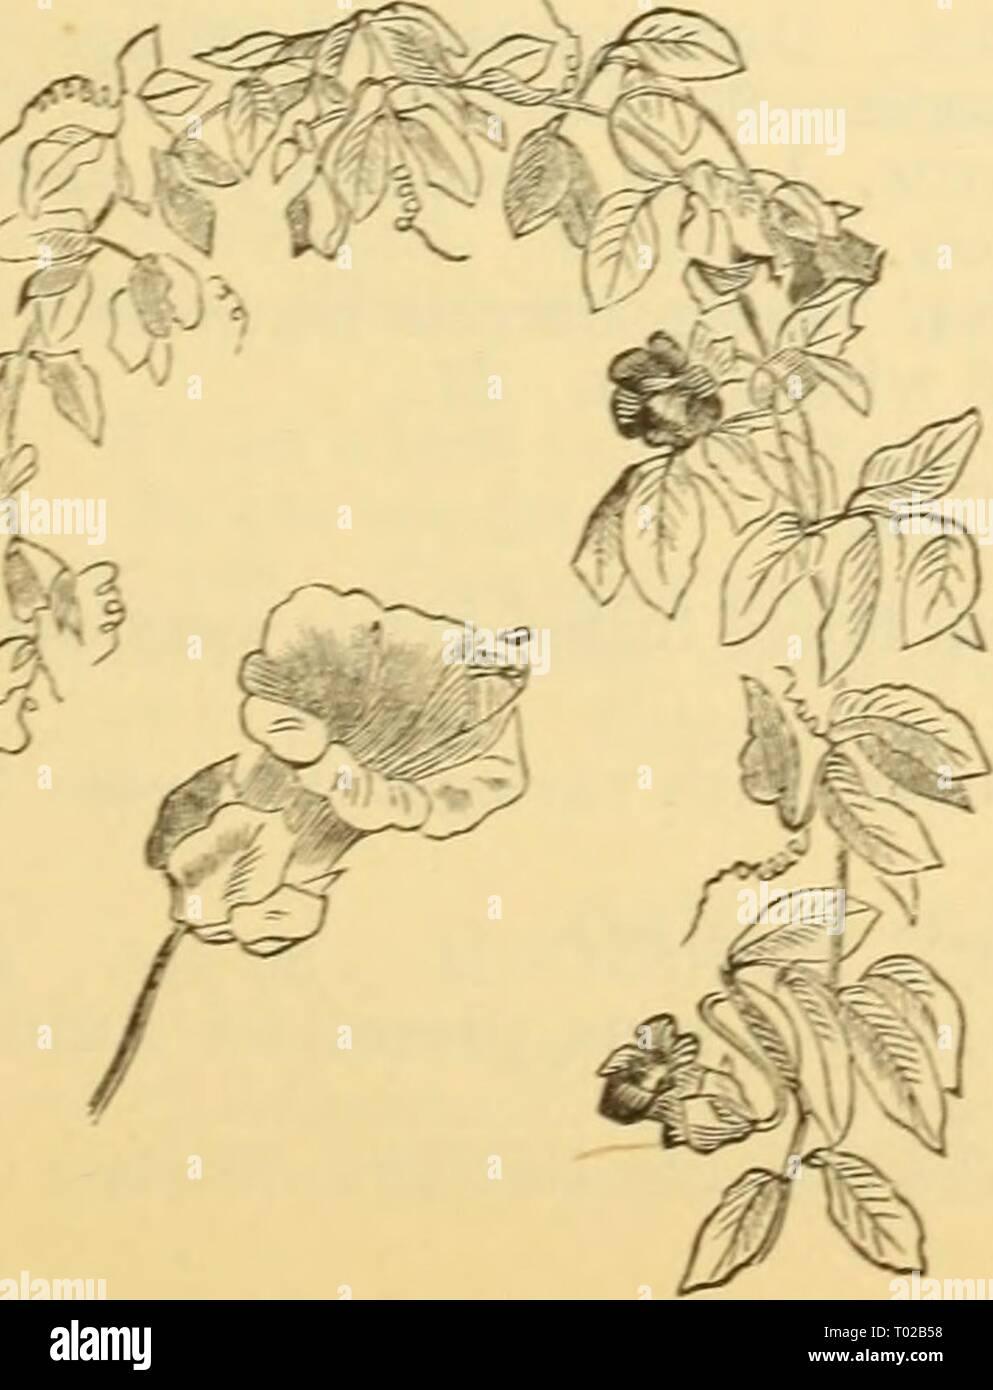 Dreers Garden Calendario 1879 Dreersgardencale1879henr Año